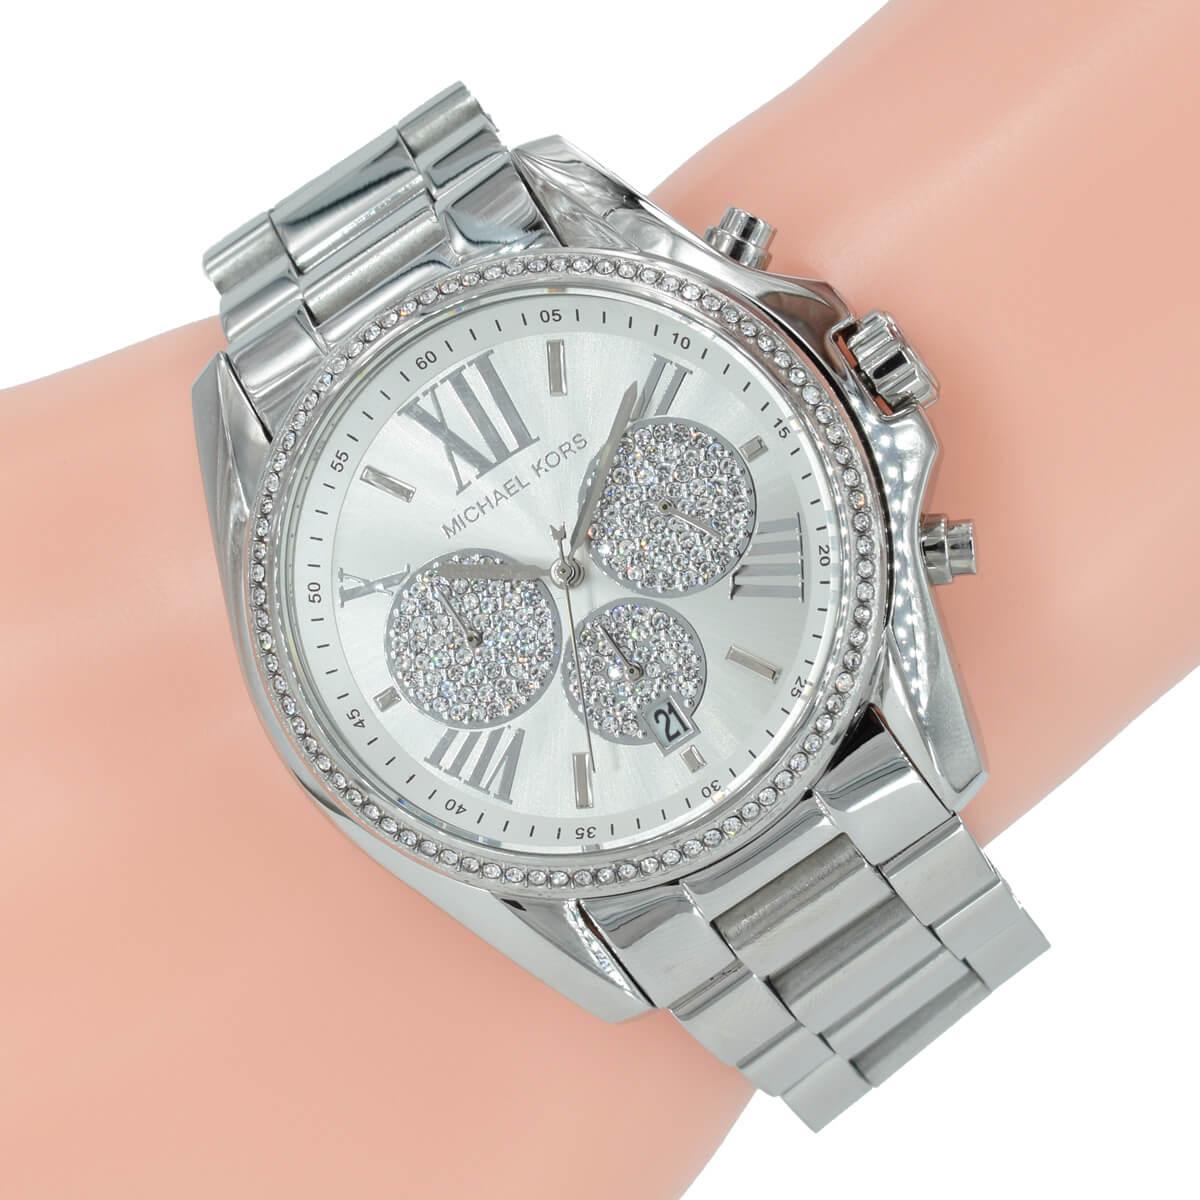 Michael Kors Damen Uhr Chronograph MK6537 Bradshaw Silber